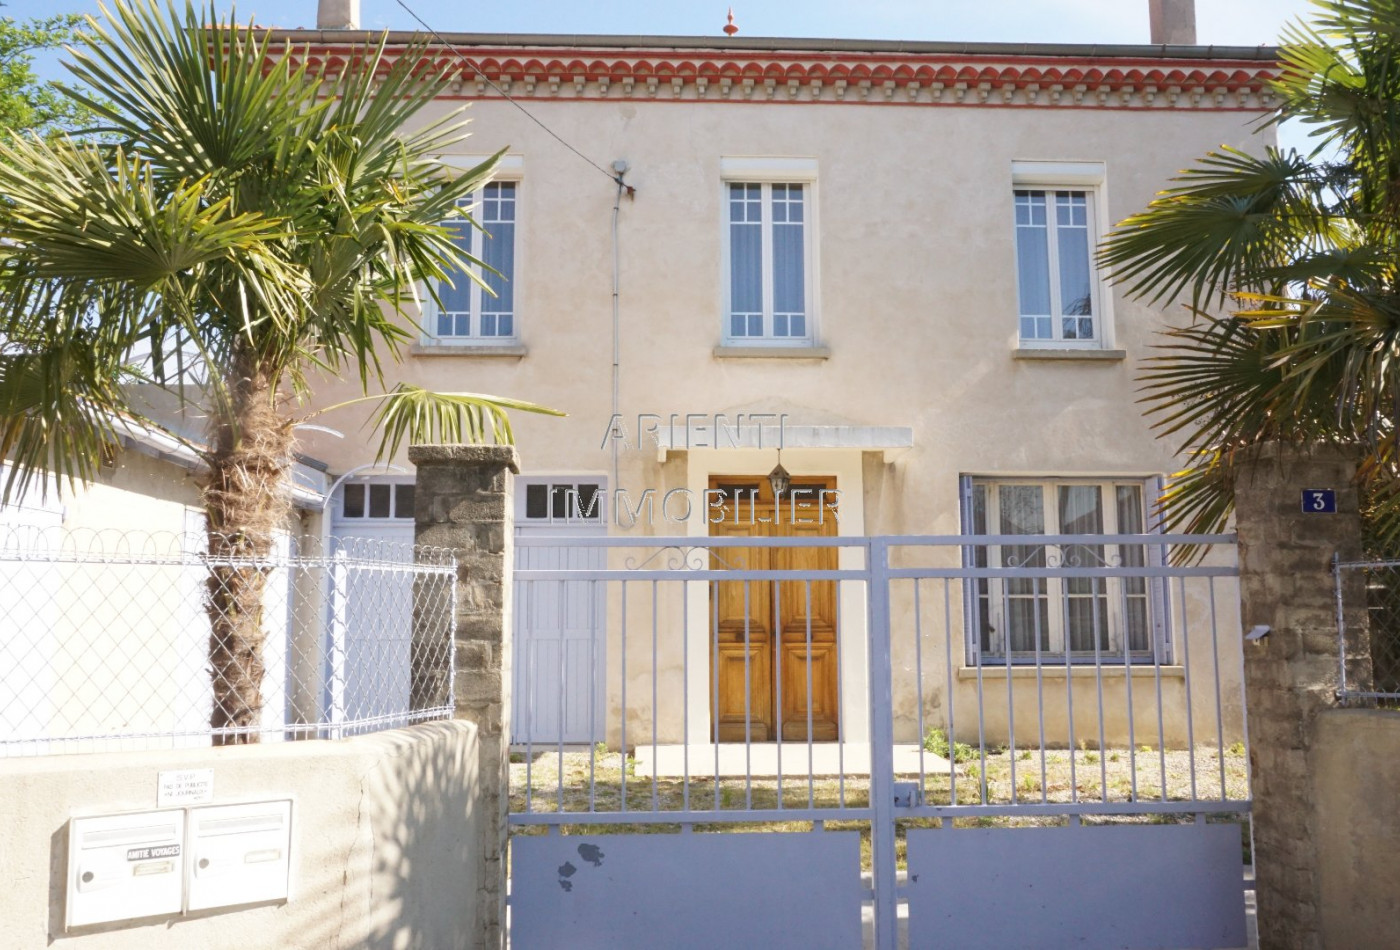 A vendre Montelimar 260013048 Office immobilier arienti